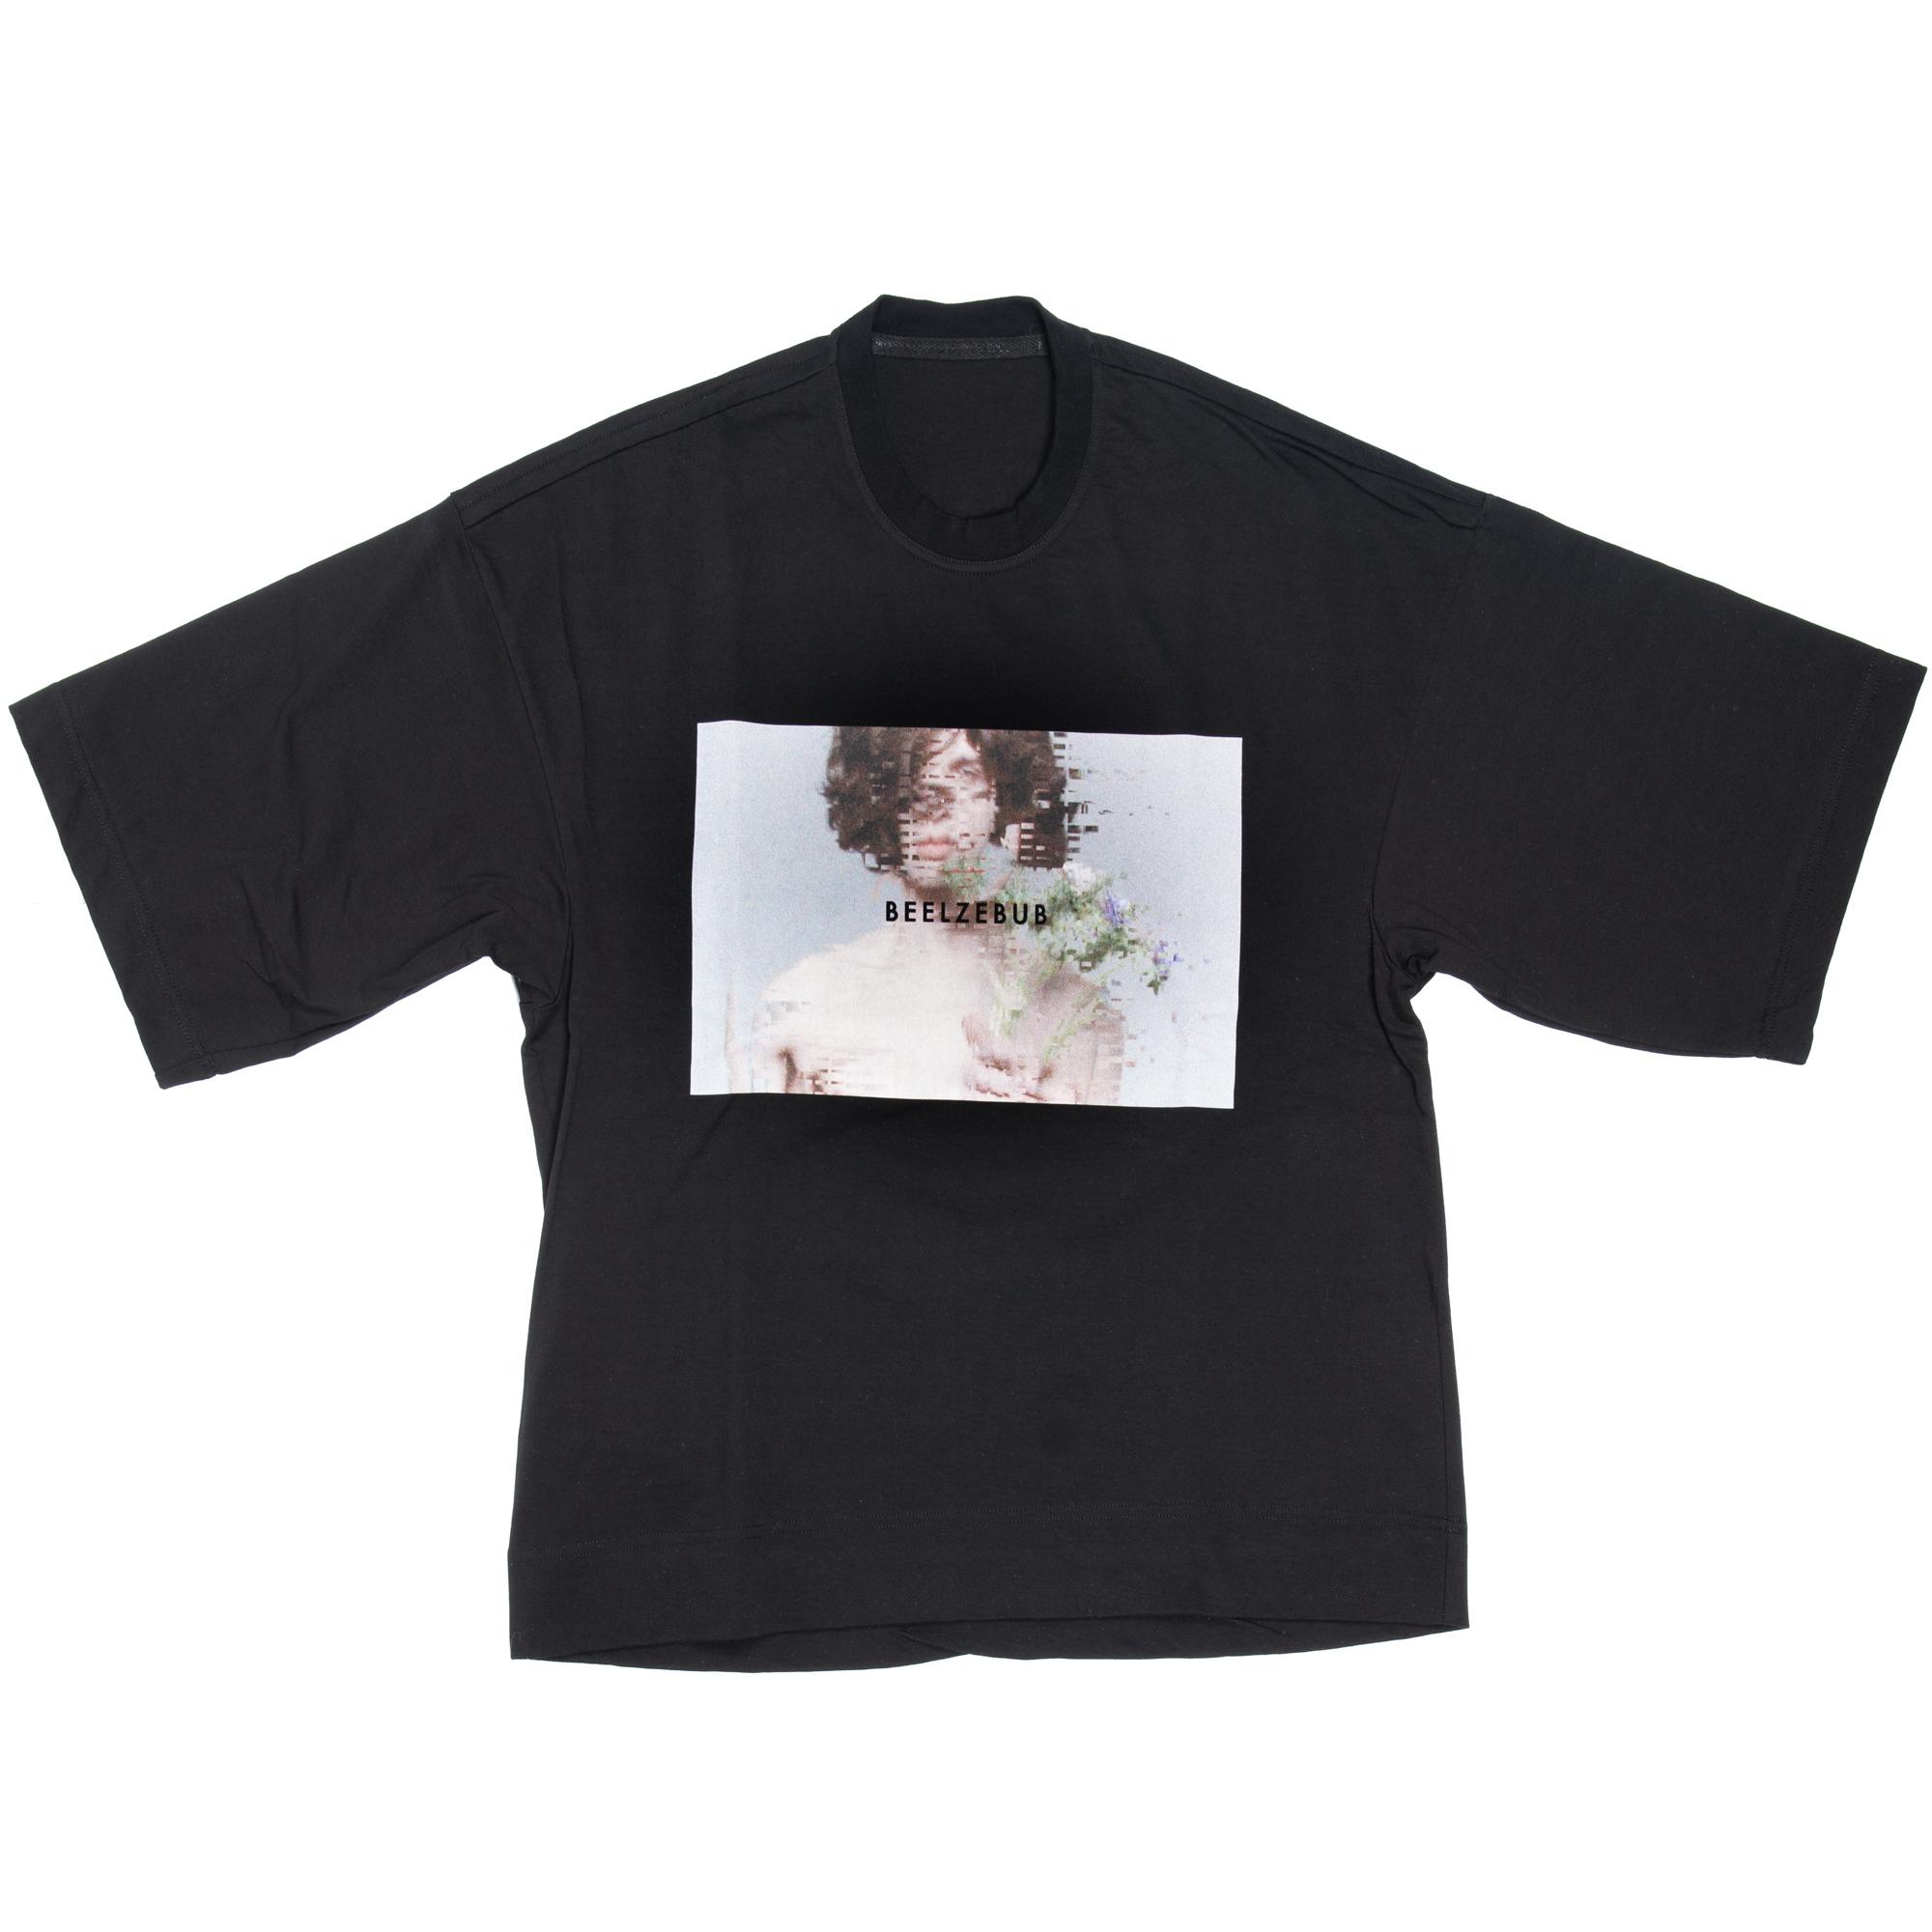 657CPM12-BLACK / プリントTシャツ